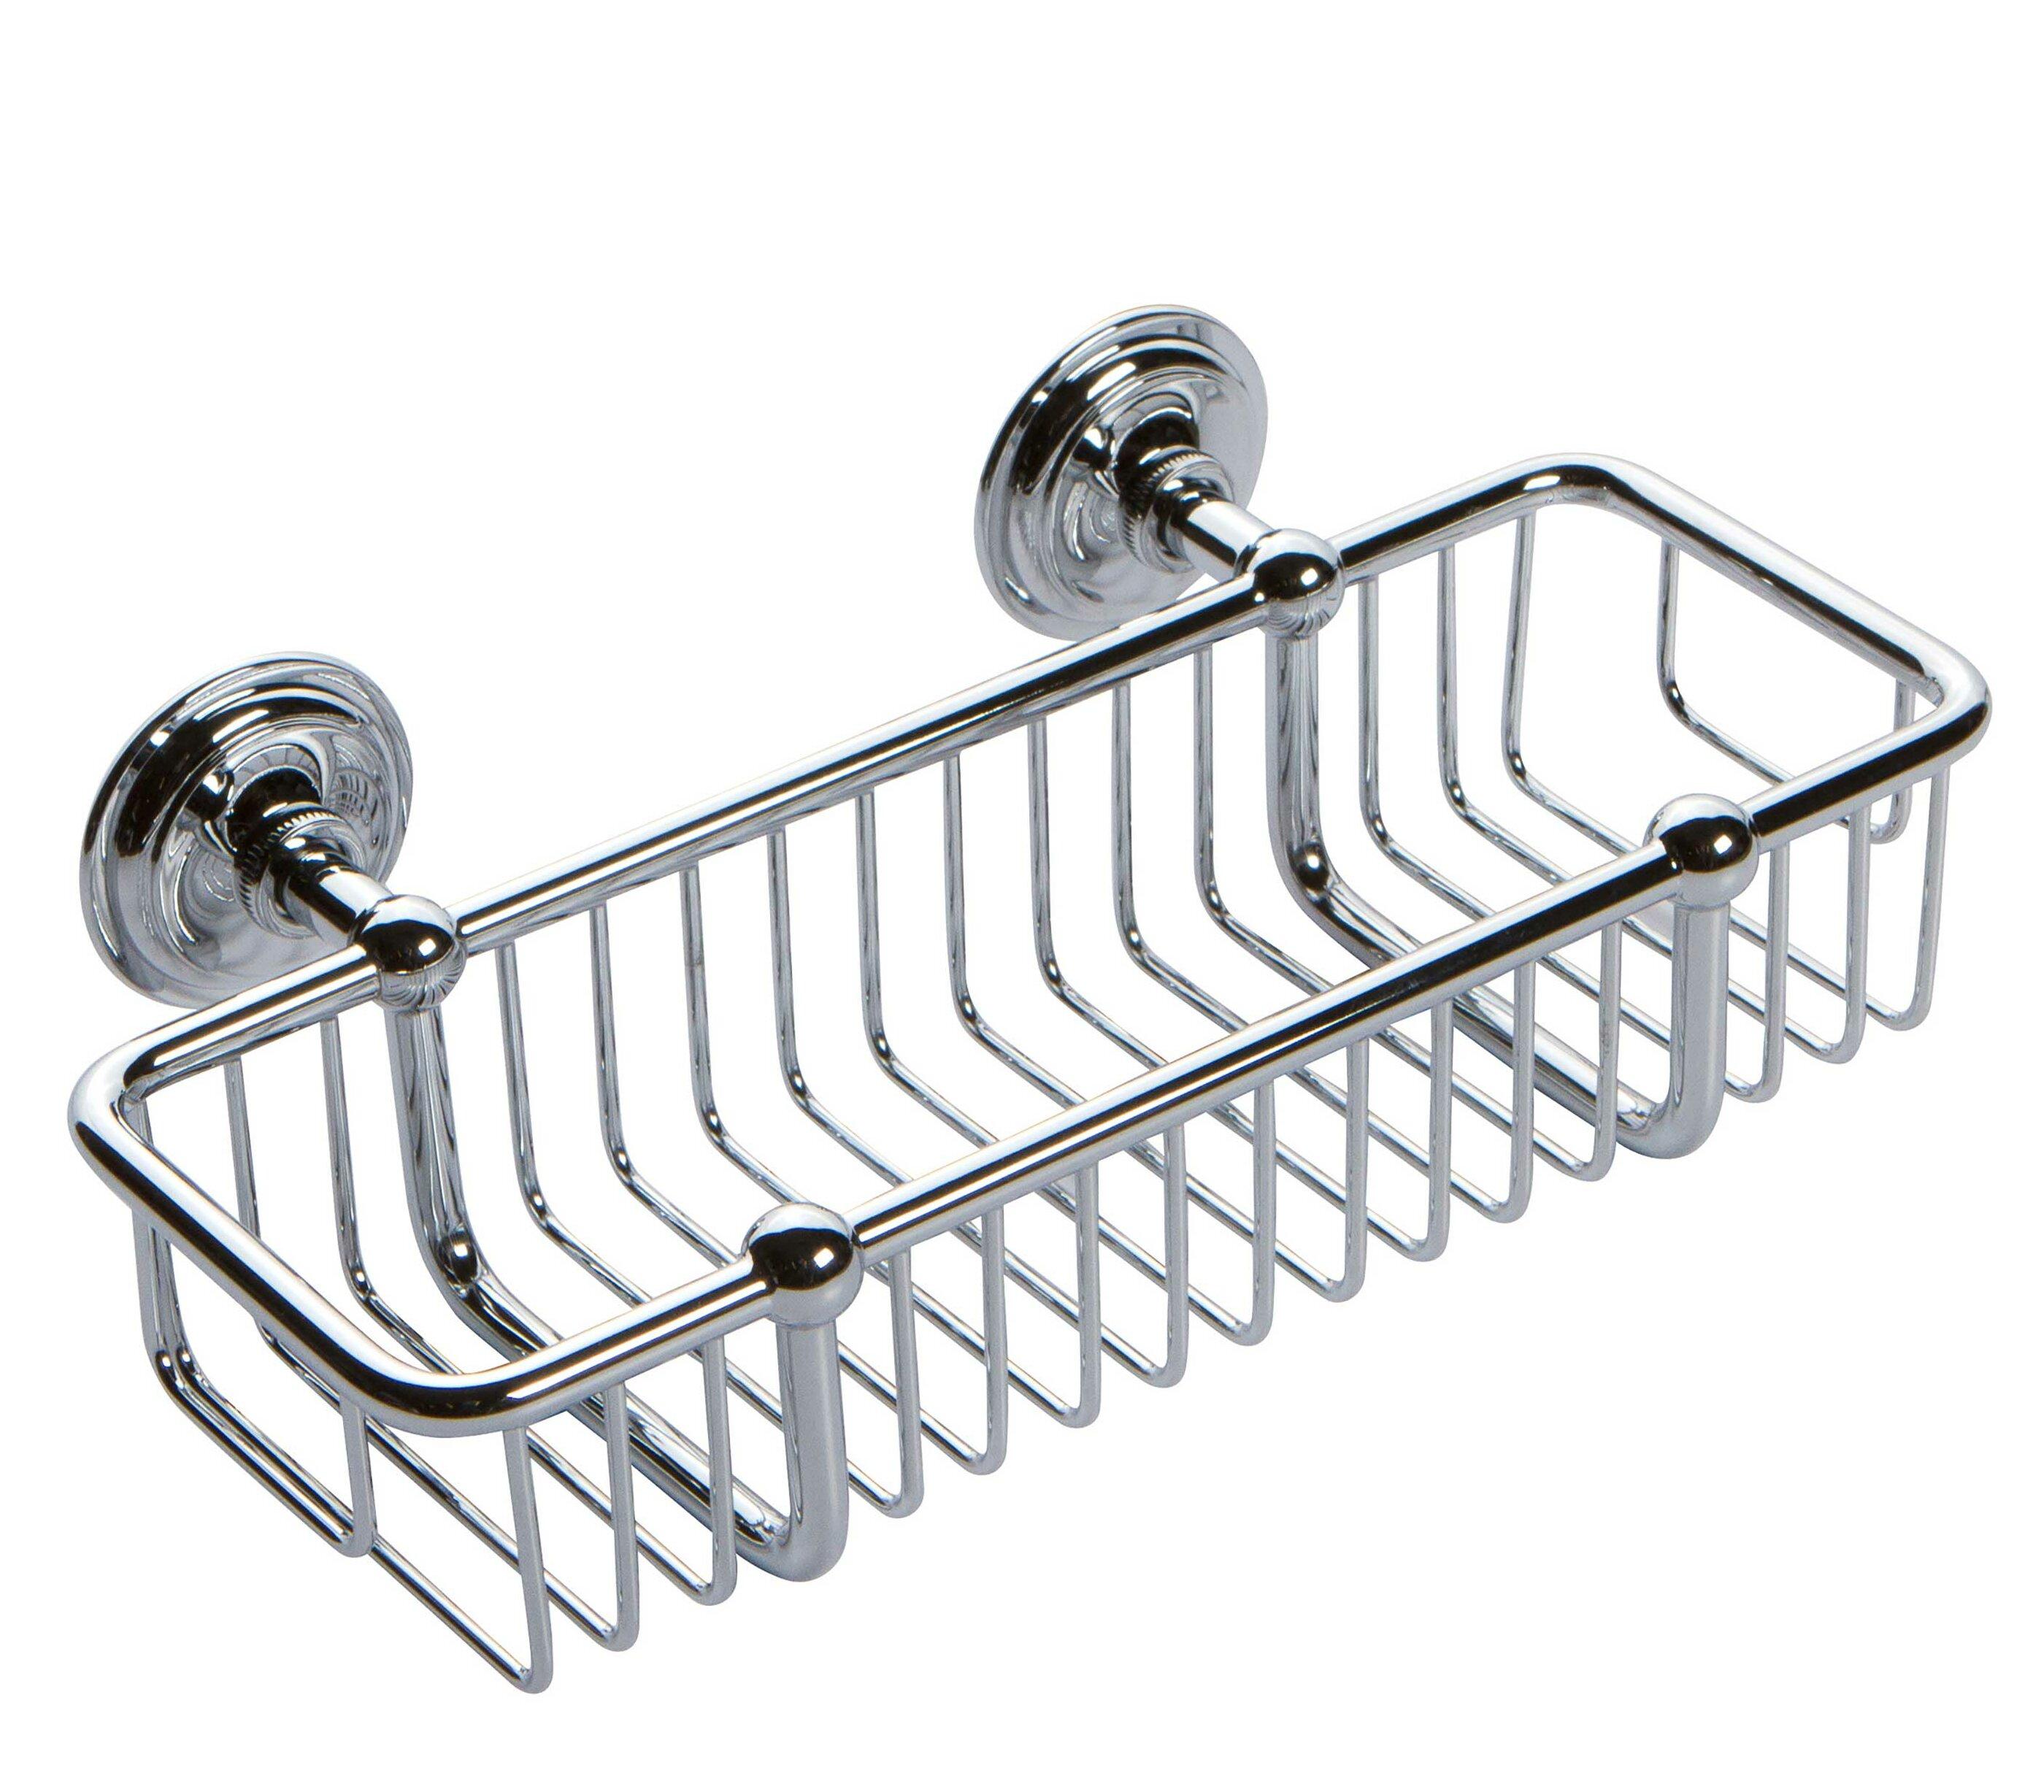 Ginger London Terrace Toiletry Basket Shower Caddy | Wayfair